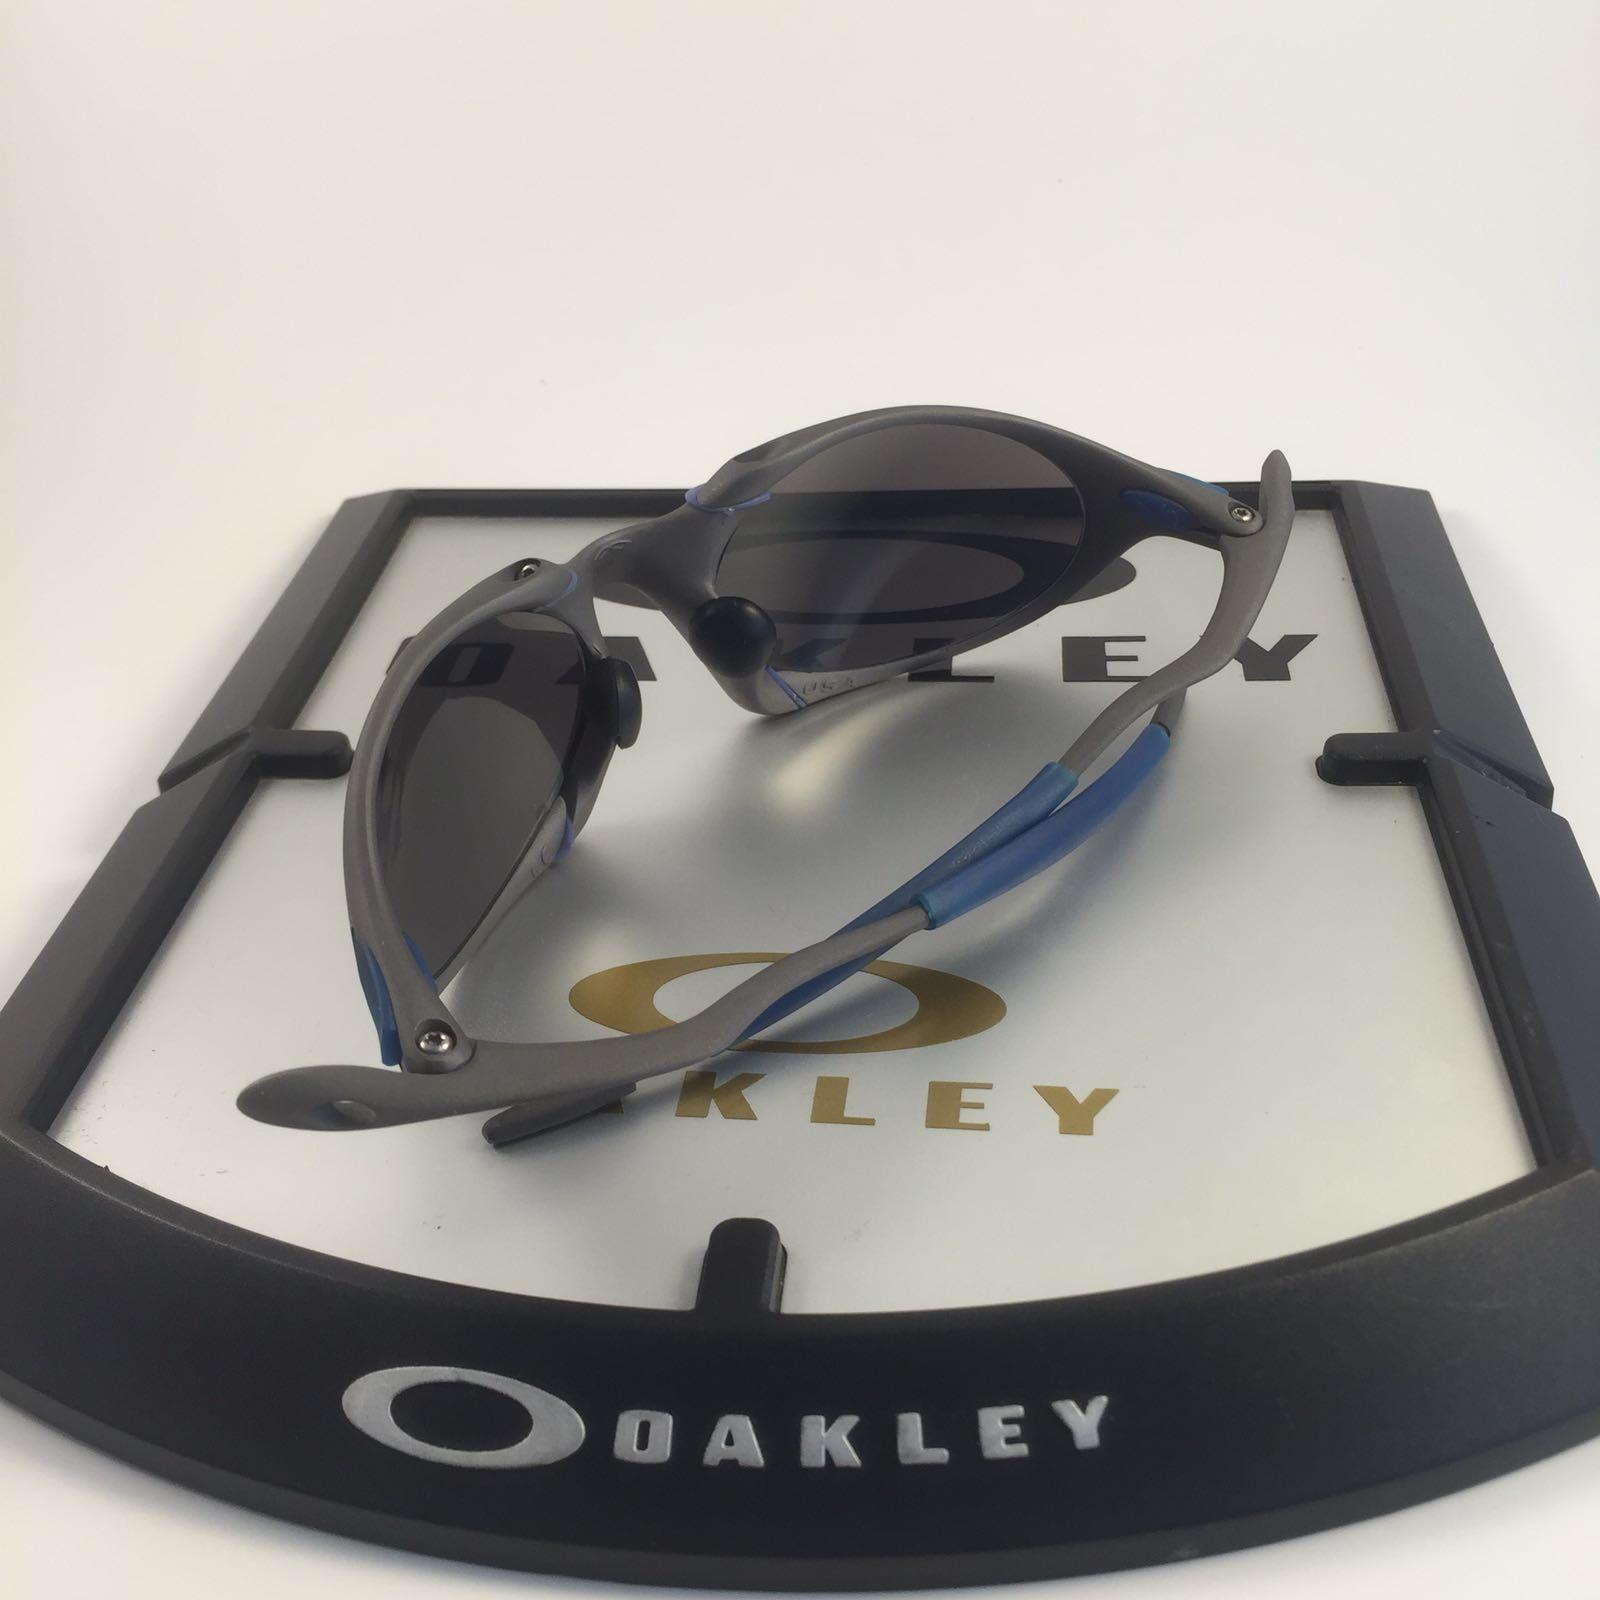 oakley romeo 1 x metal - 10df4329-45af-4f0a-b4e6-77811e4f7388.jpeg